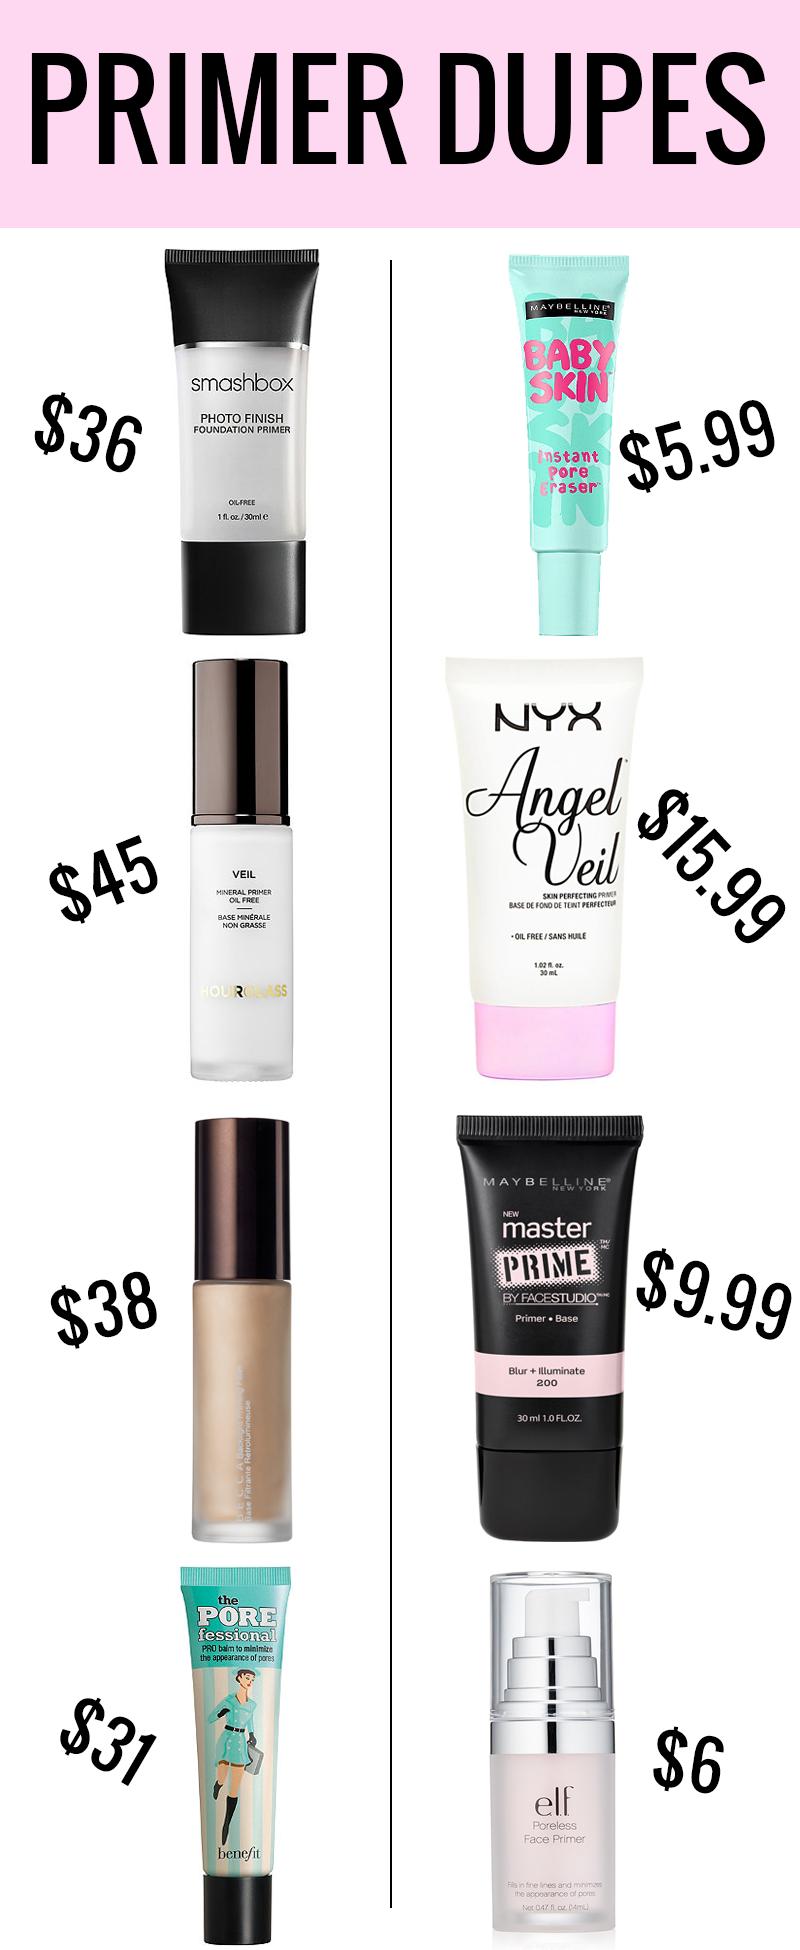 Makeup Primer Dupes Drugstore makeup dupes, Makeup